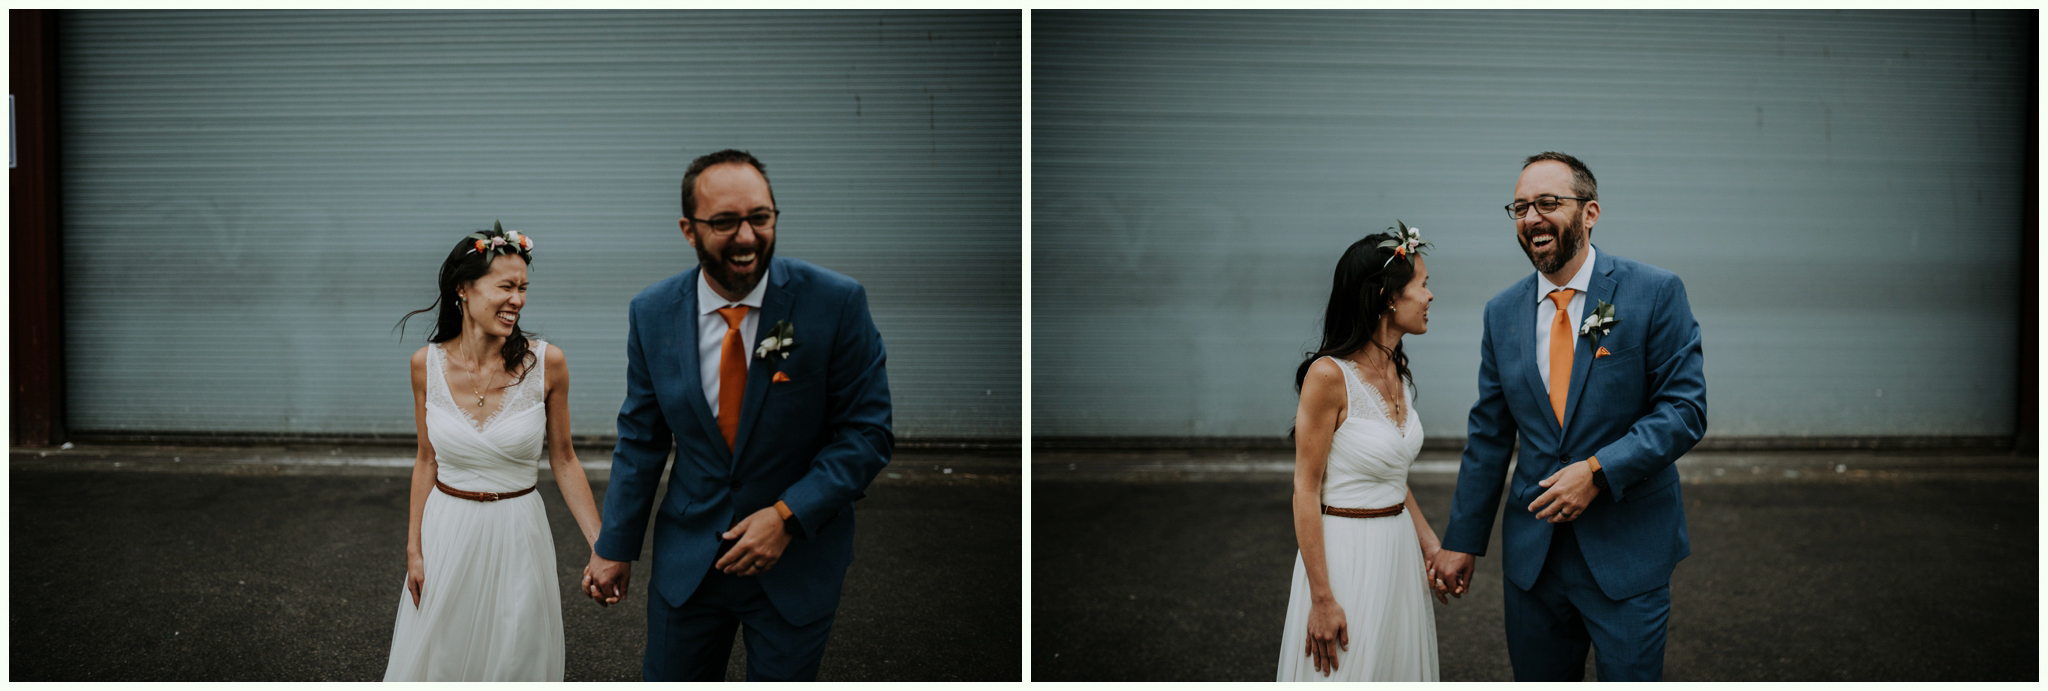 within-sodo-june-wedding-seattle-photographer-caitlyn-nikula-87.jpg